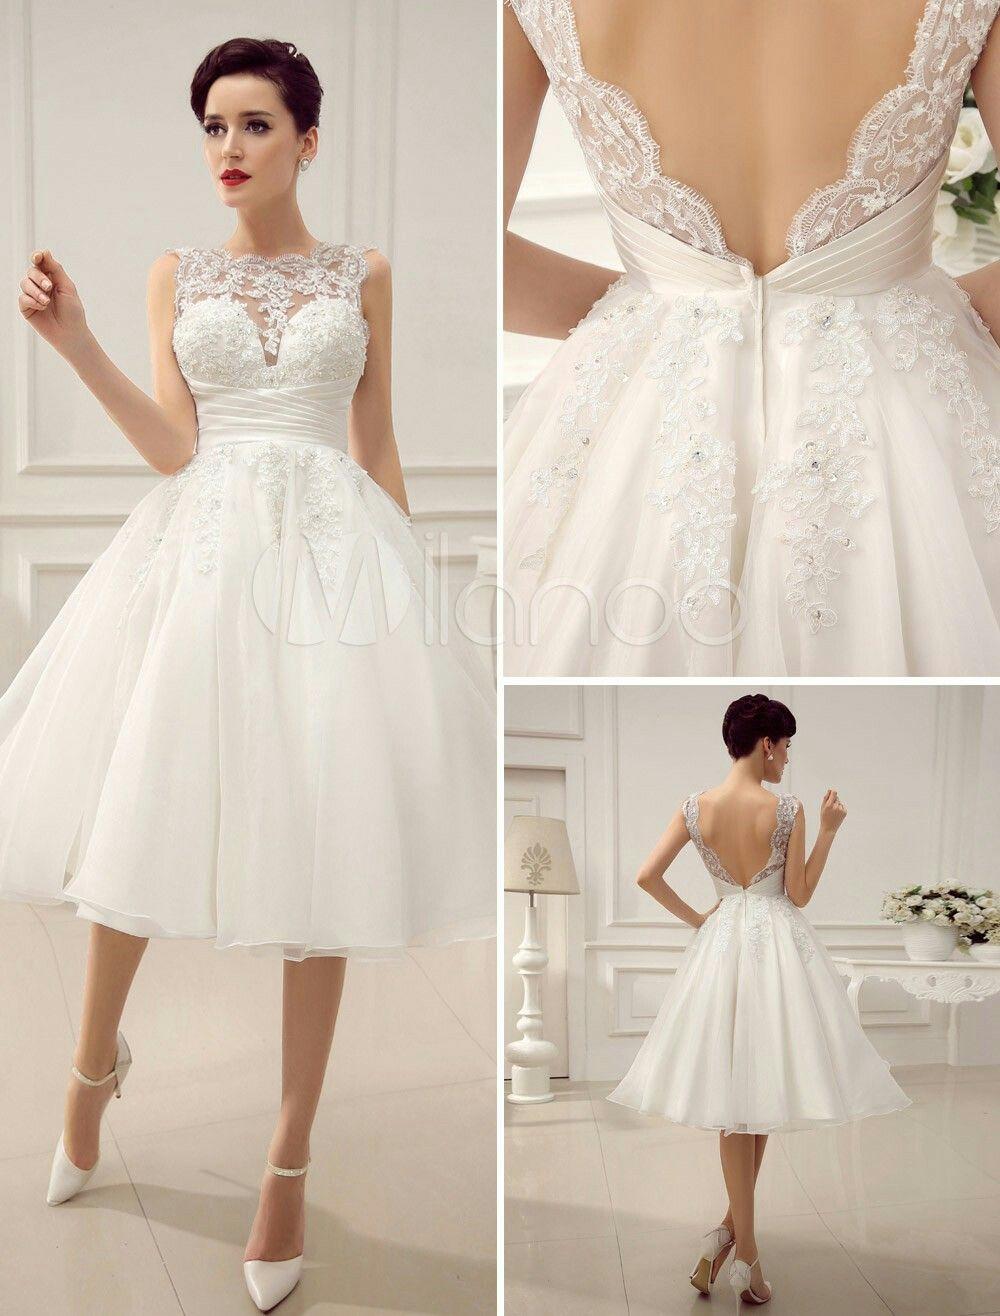 Vestido novia corto boda civil